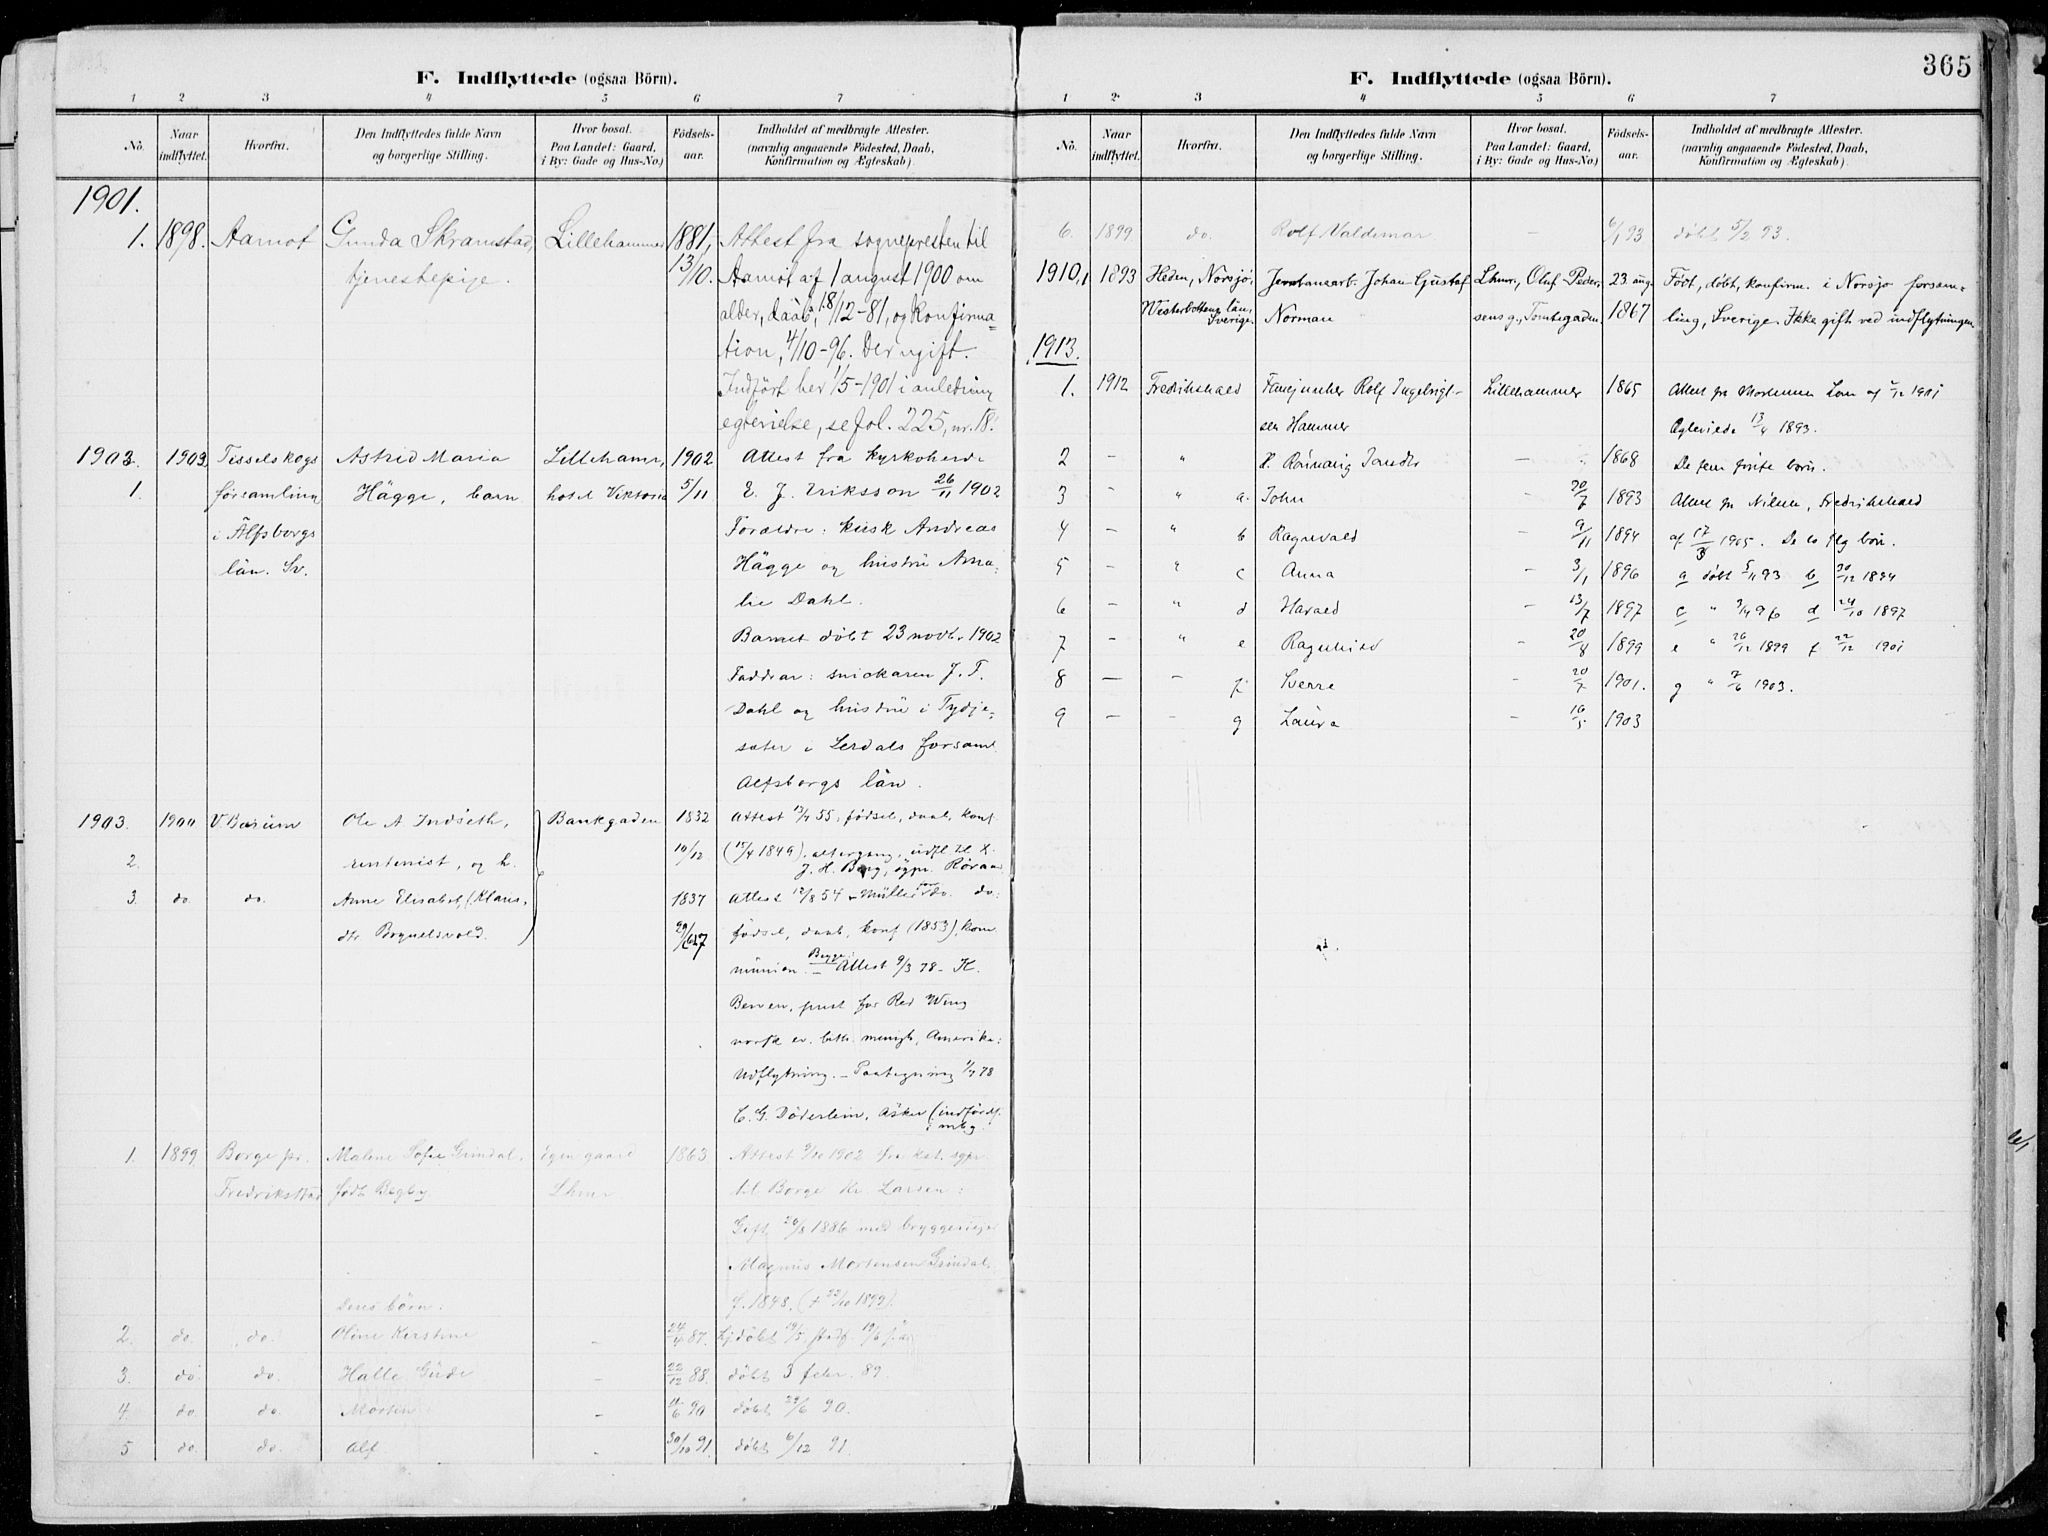 SAH, Lillehammer prestekontor, Ministerialbok nr. 1, 1901-1916, s. 365